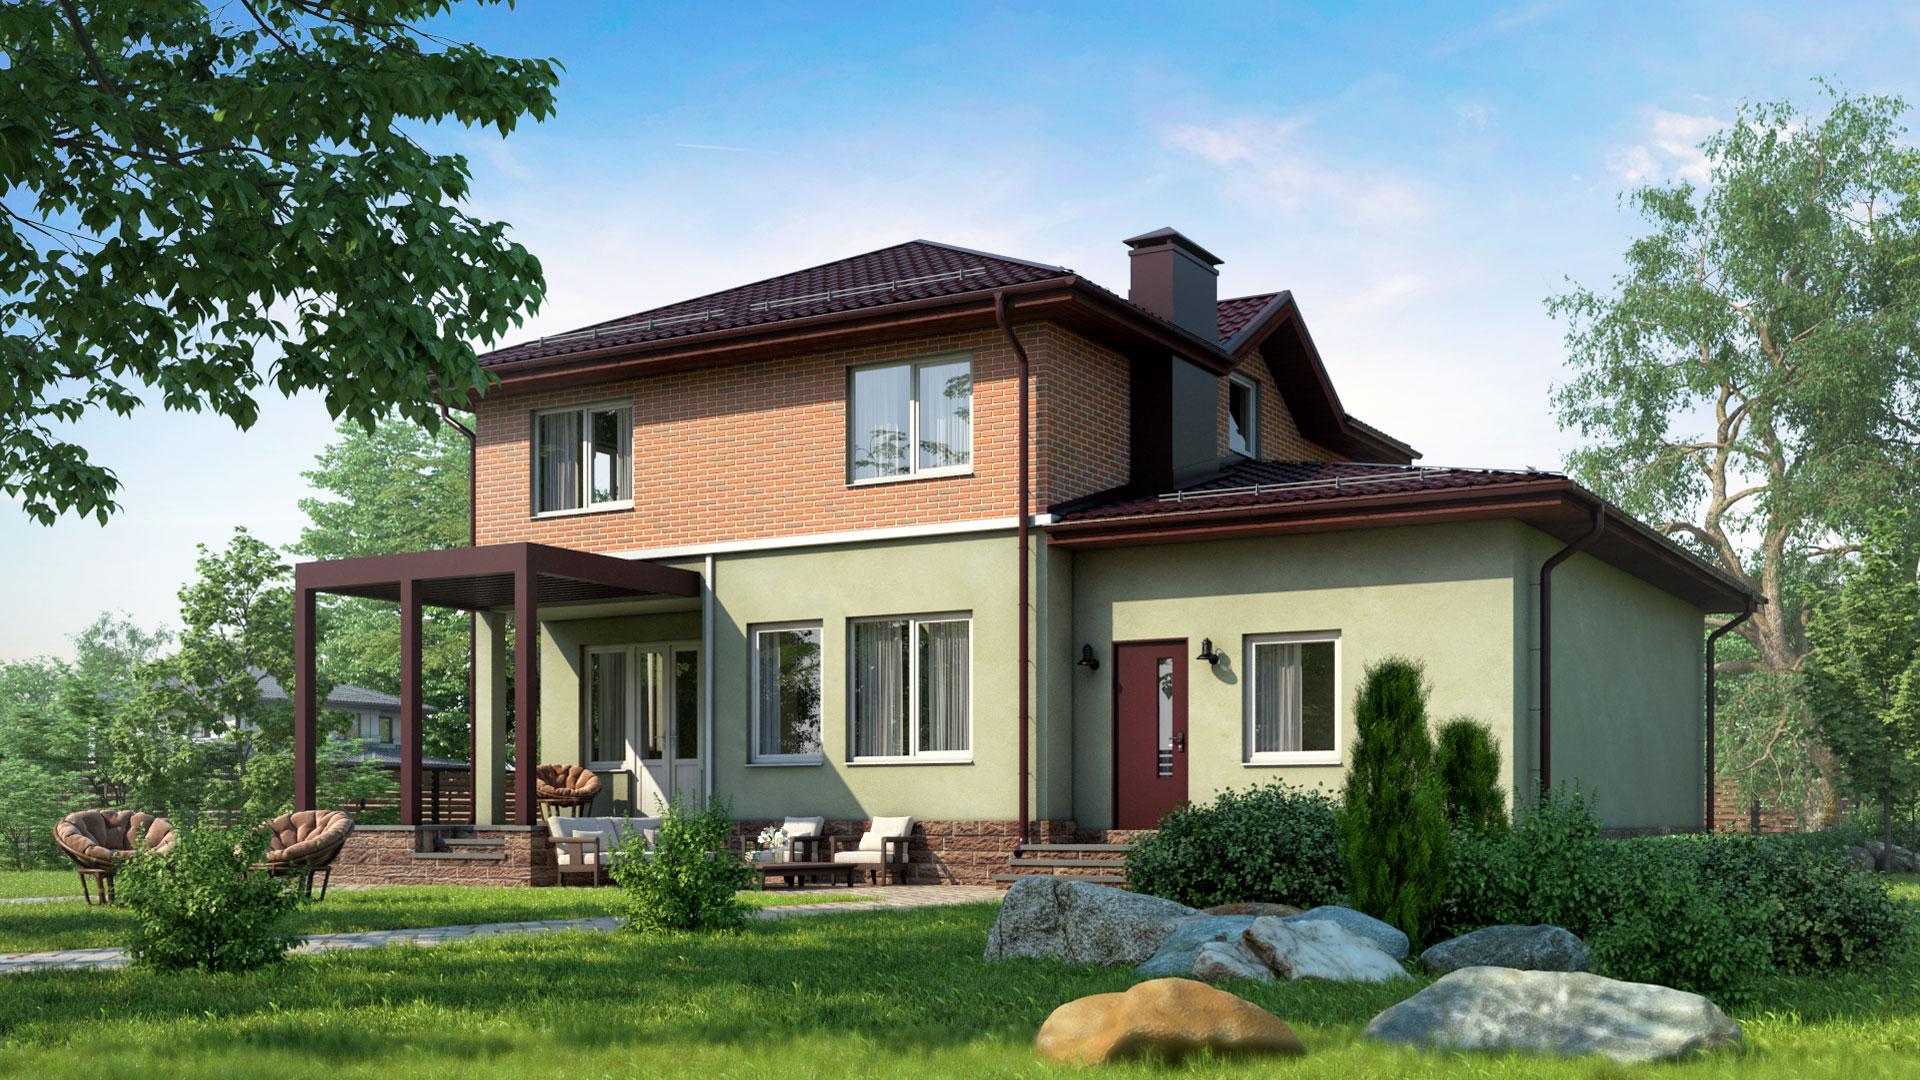 Задний фасад дома БП-185 164,60 м2, 10 на 12 метров двухэтажного.